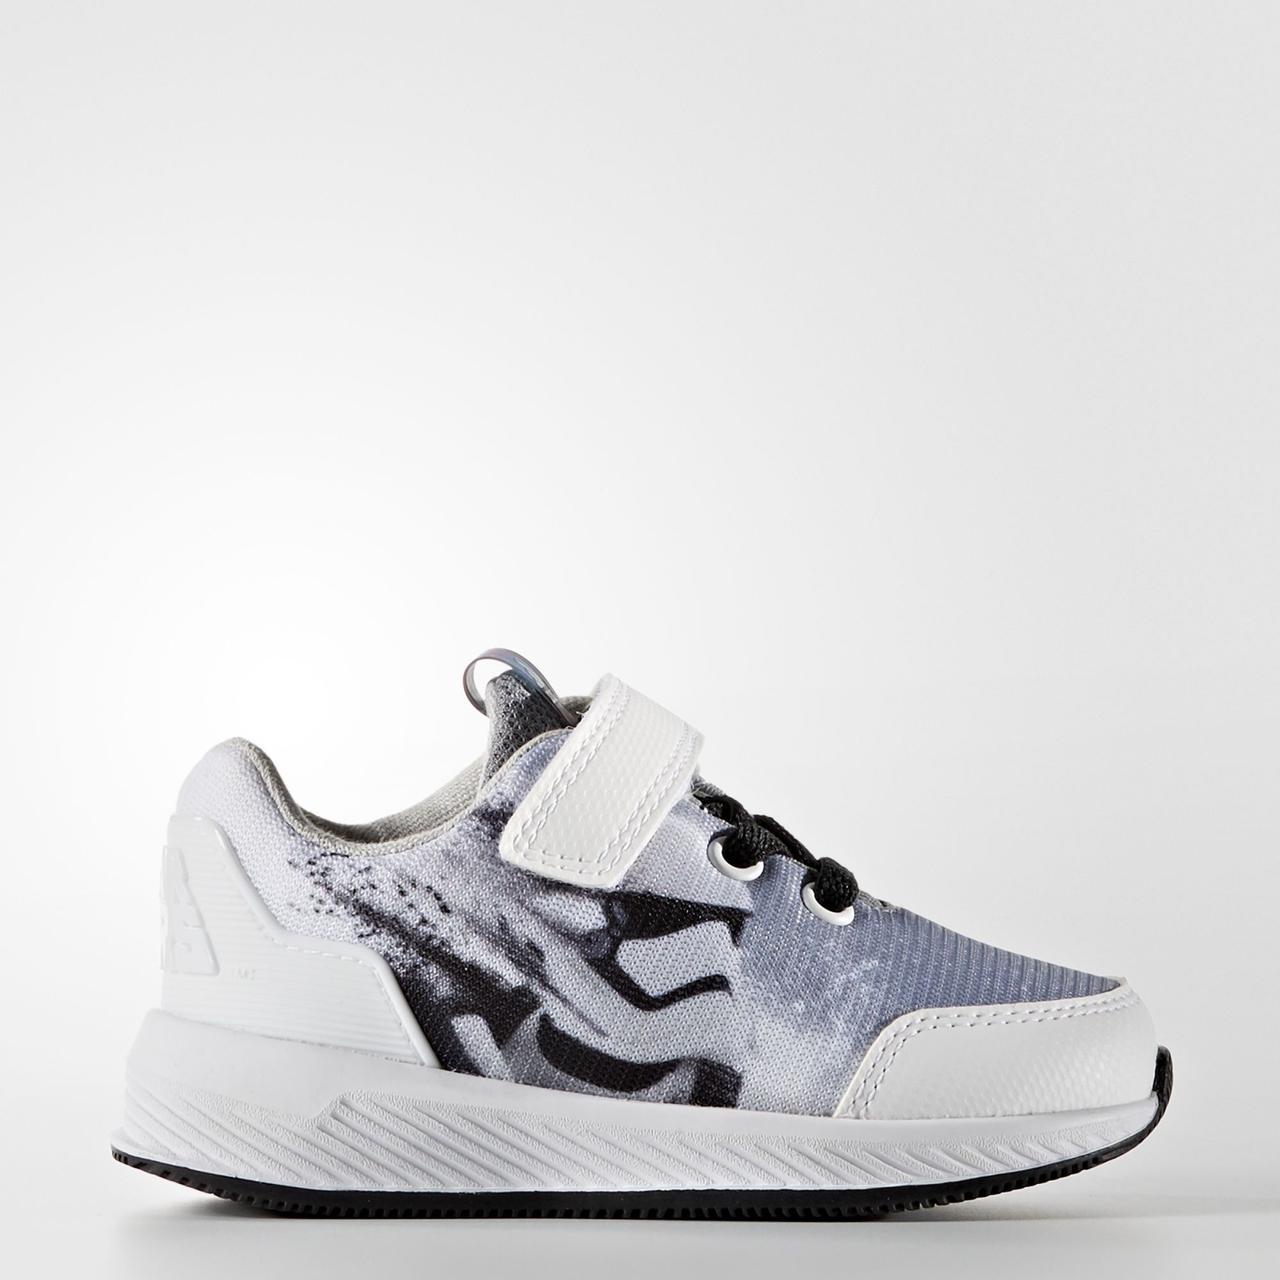 e0c89000 Детские кроссовки Adidas Performance Star Wars (Артикул: BY9242) -  Интернет-магазин «